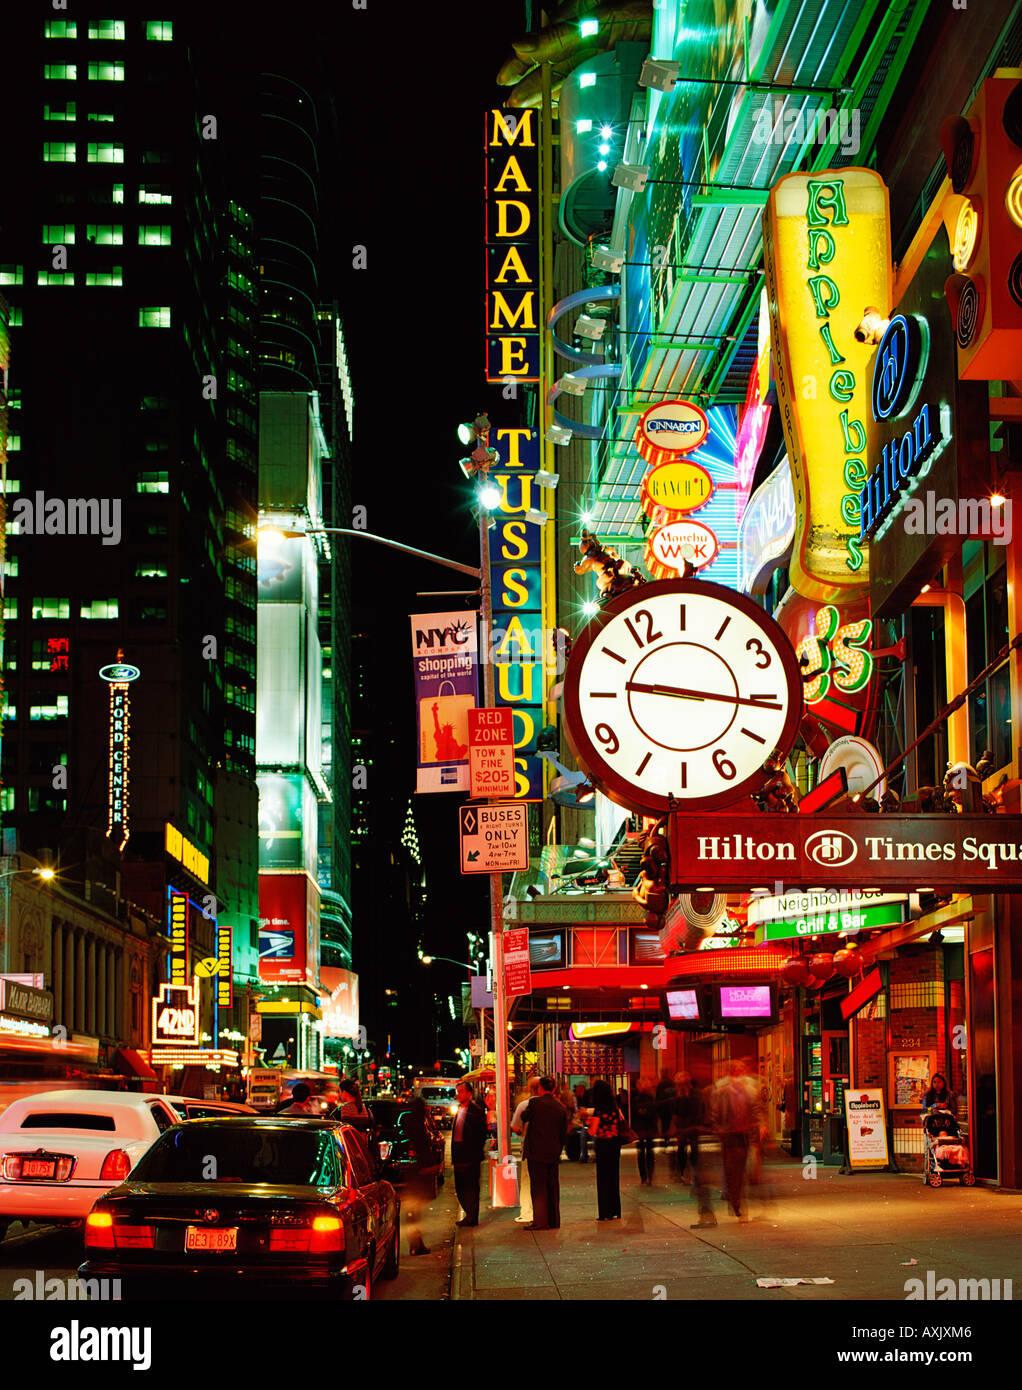 USA  NEW YORK  42nd STREET - Stock Image